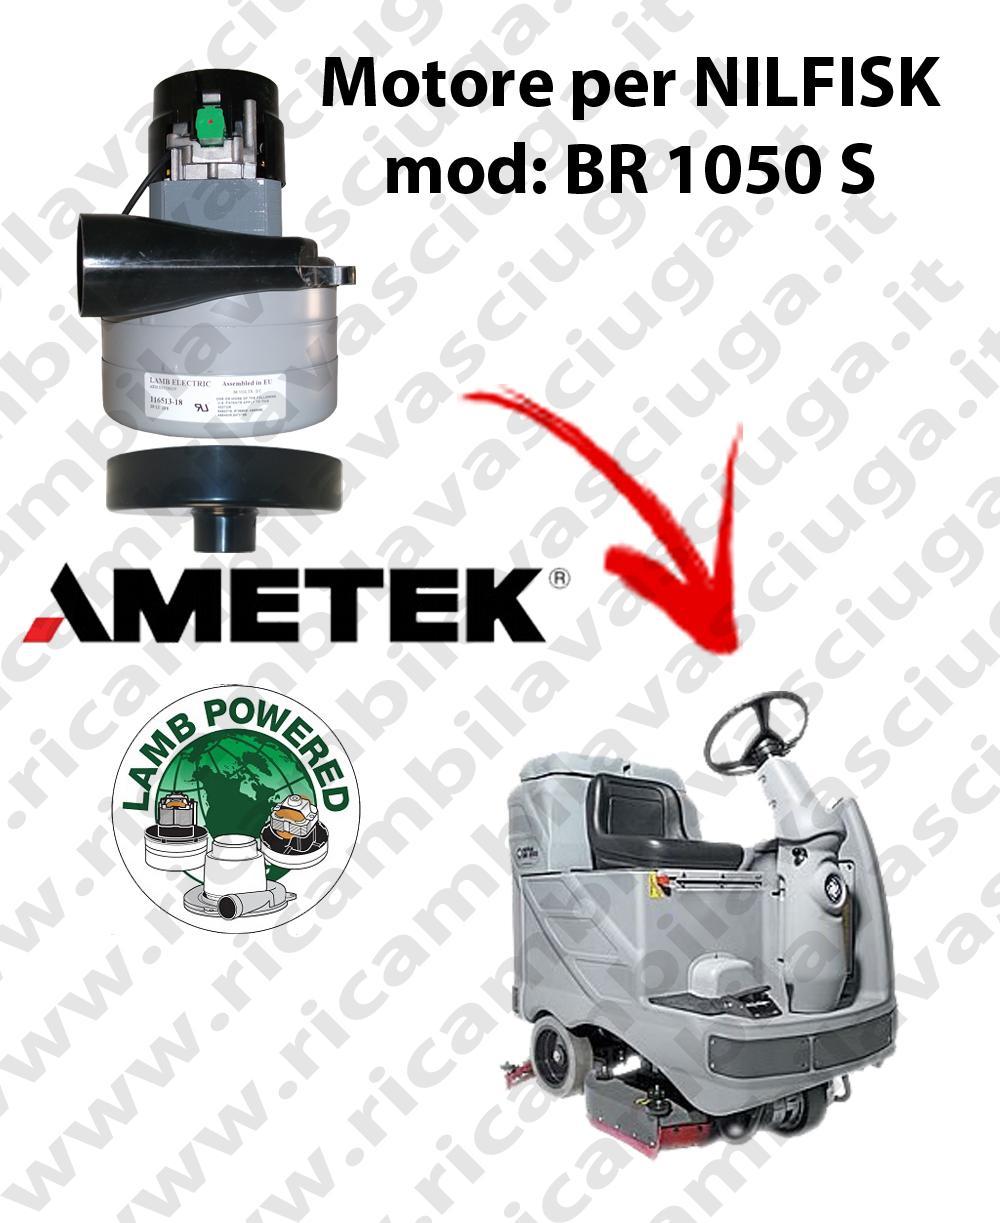 BR 1050 S Motore de aspiración LAMB AMETEK para fregadora NILFISK